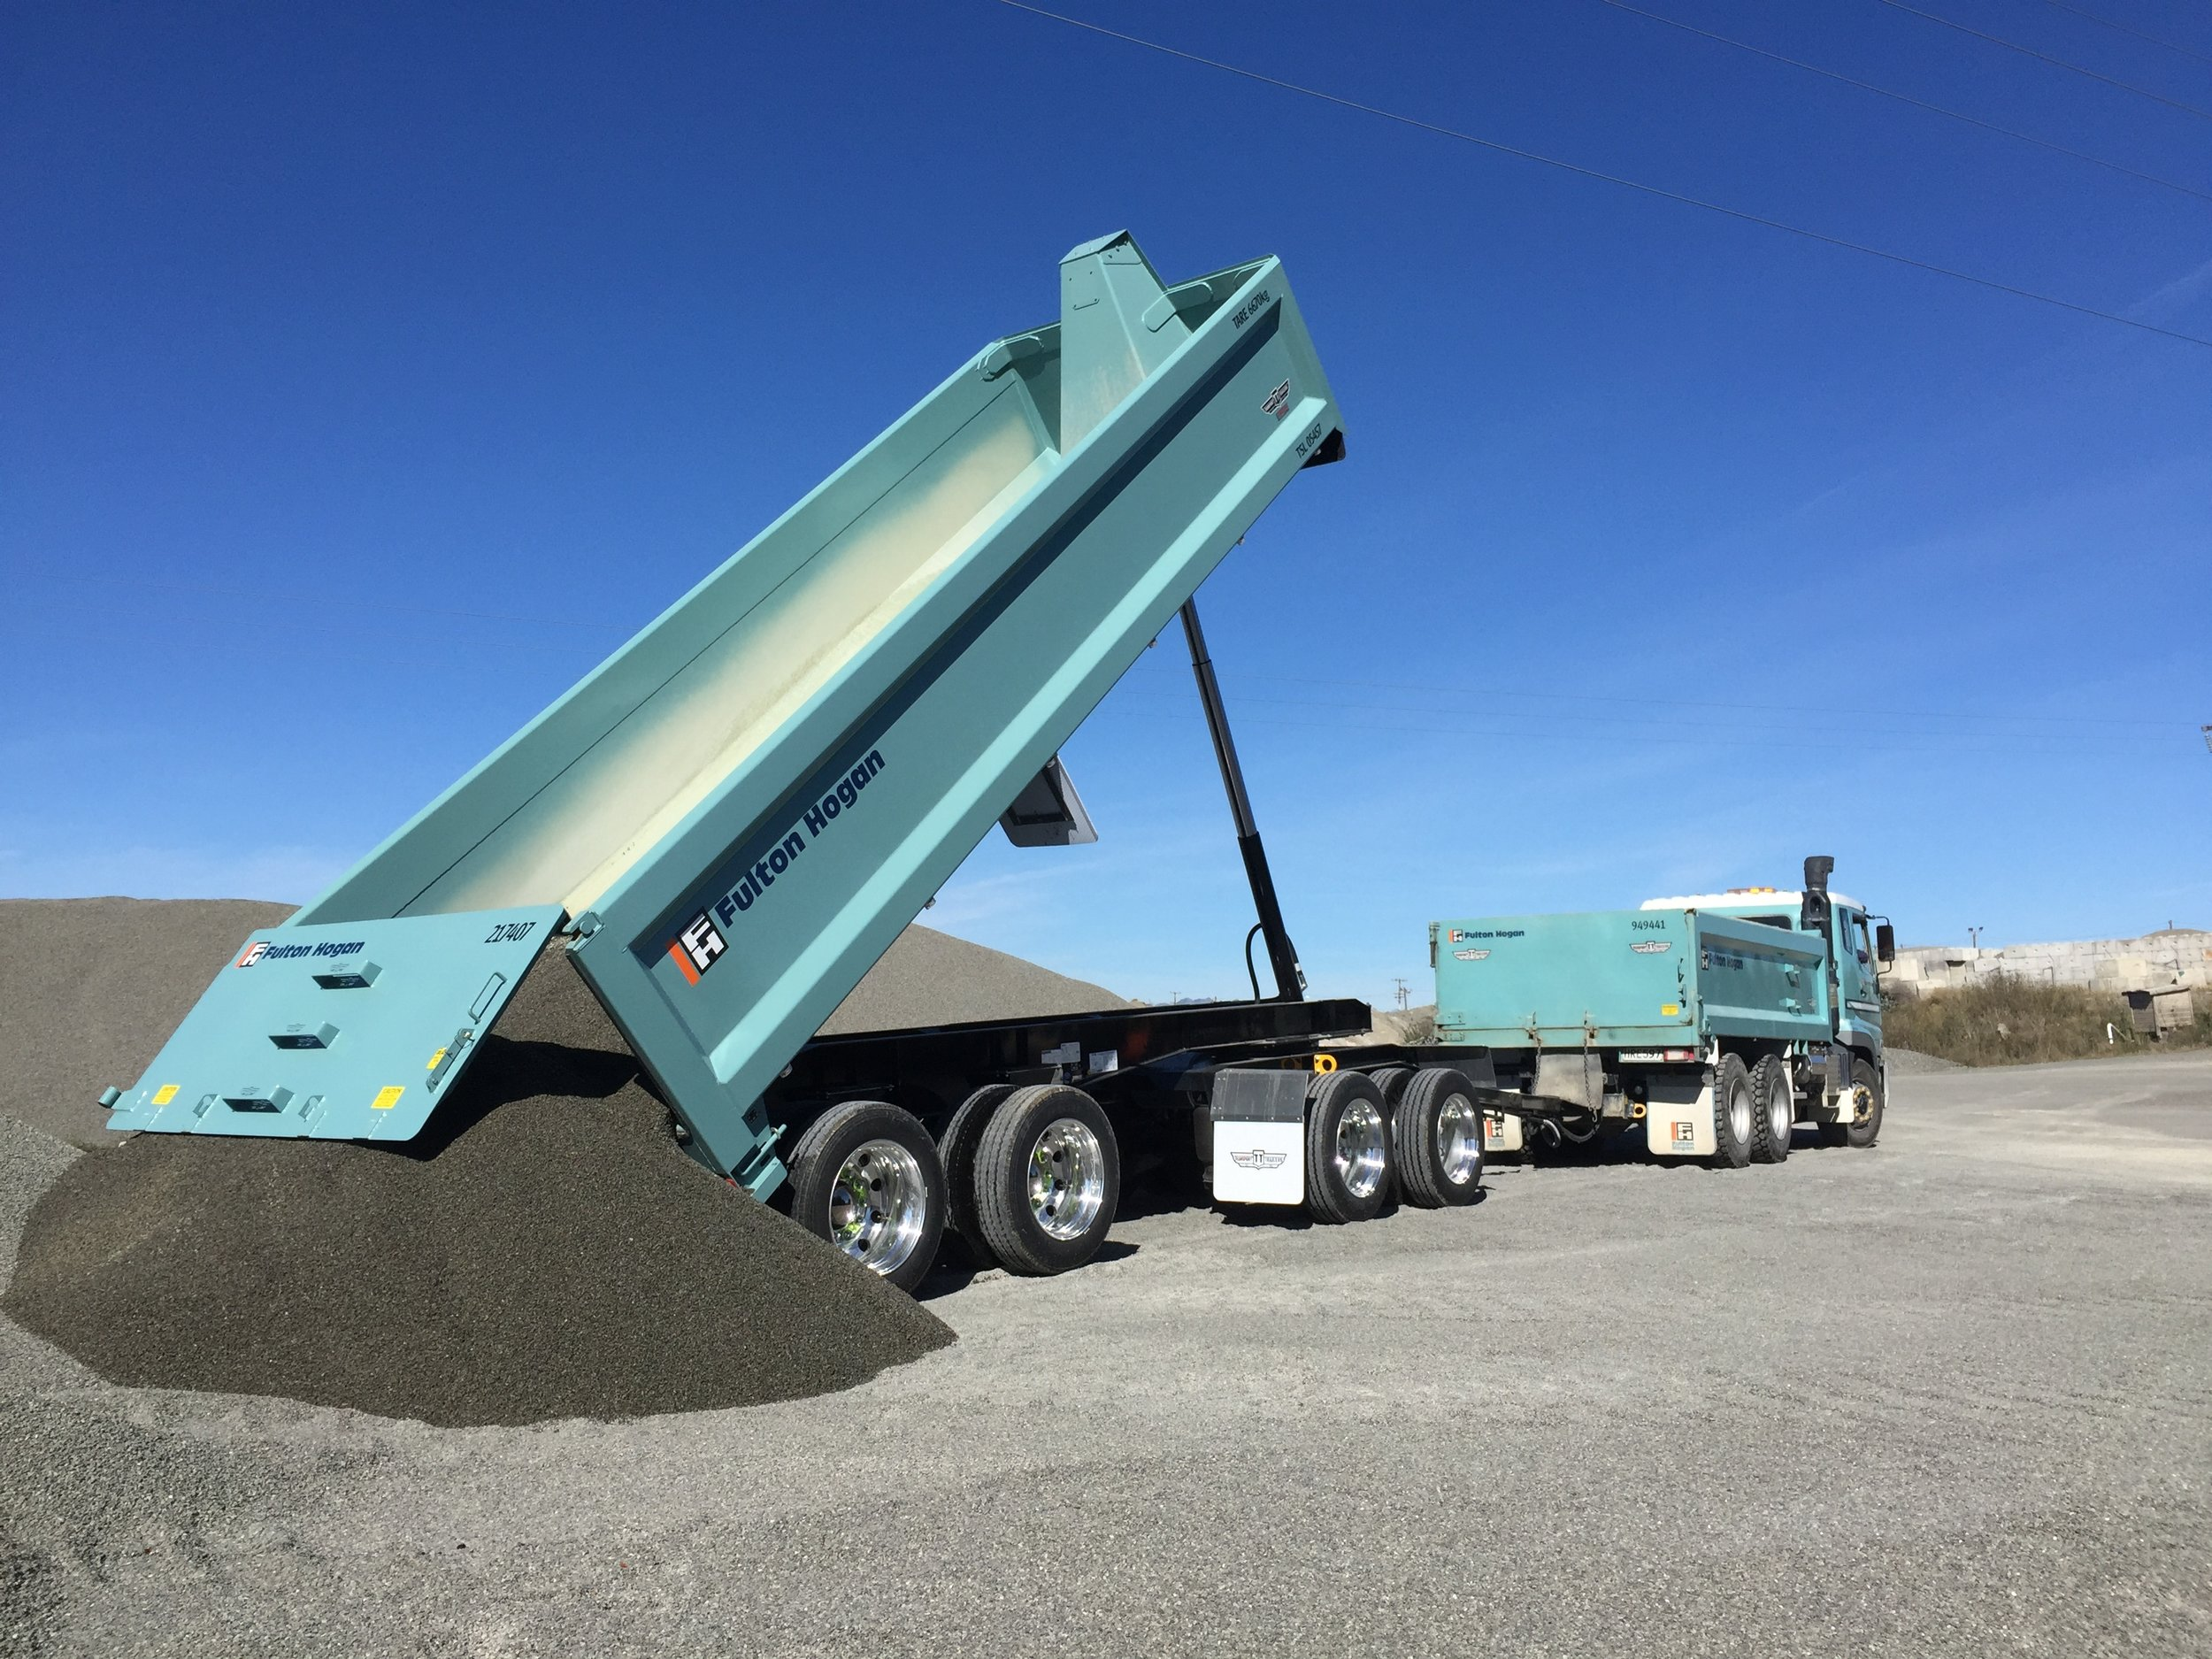 Fulton Hogan Hardox Truck and Trailer